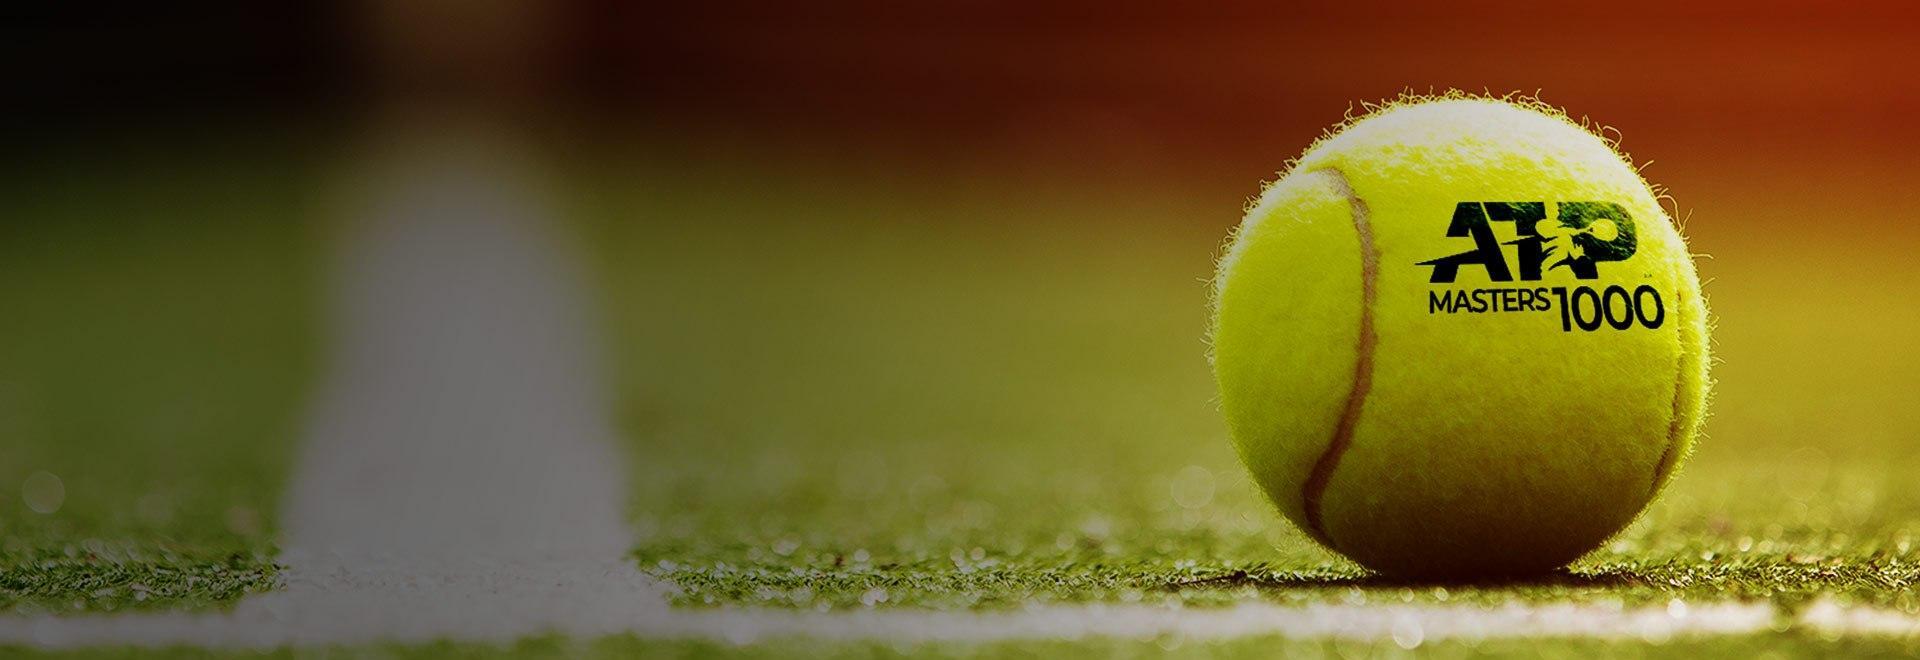 ATP World Tour Masters 1000 HL 2021